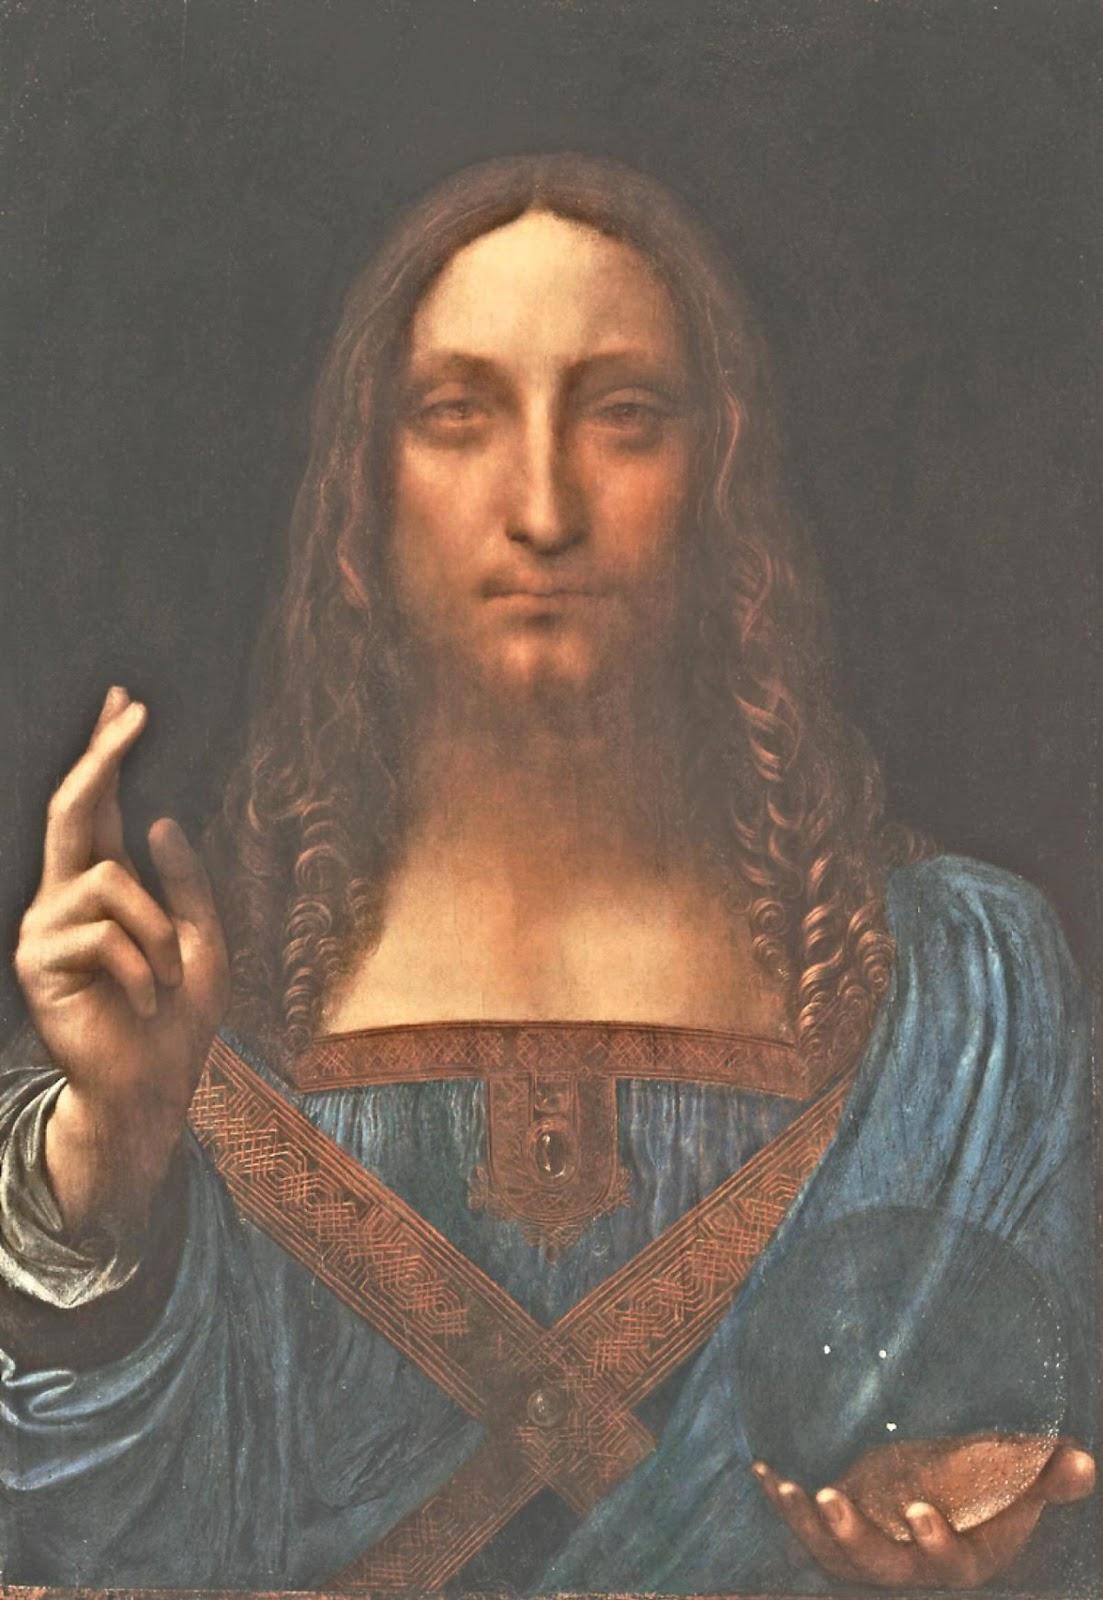 Da Vinci Paintings Mirrored By leonardo da vinci? Da Vinci Paintings Mirrored